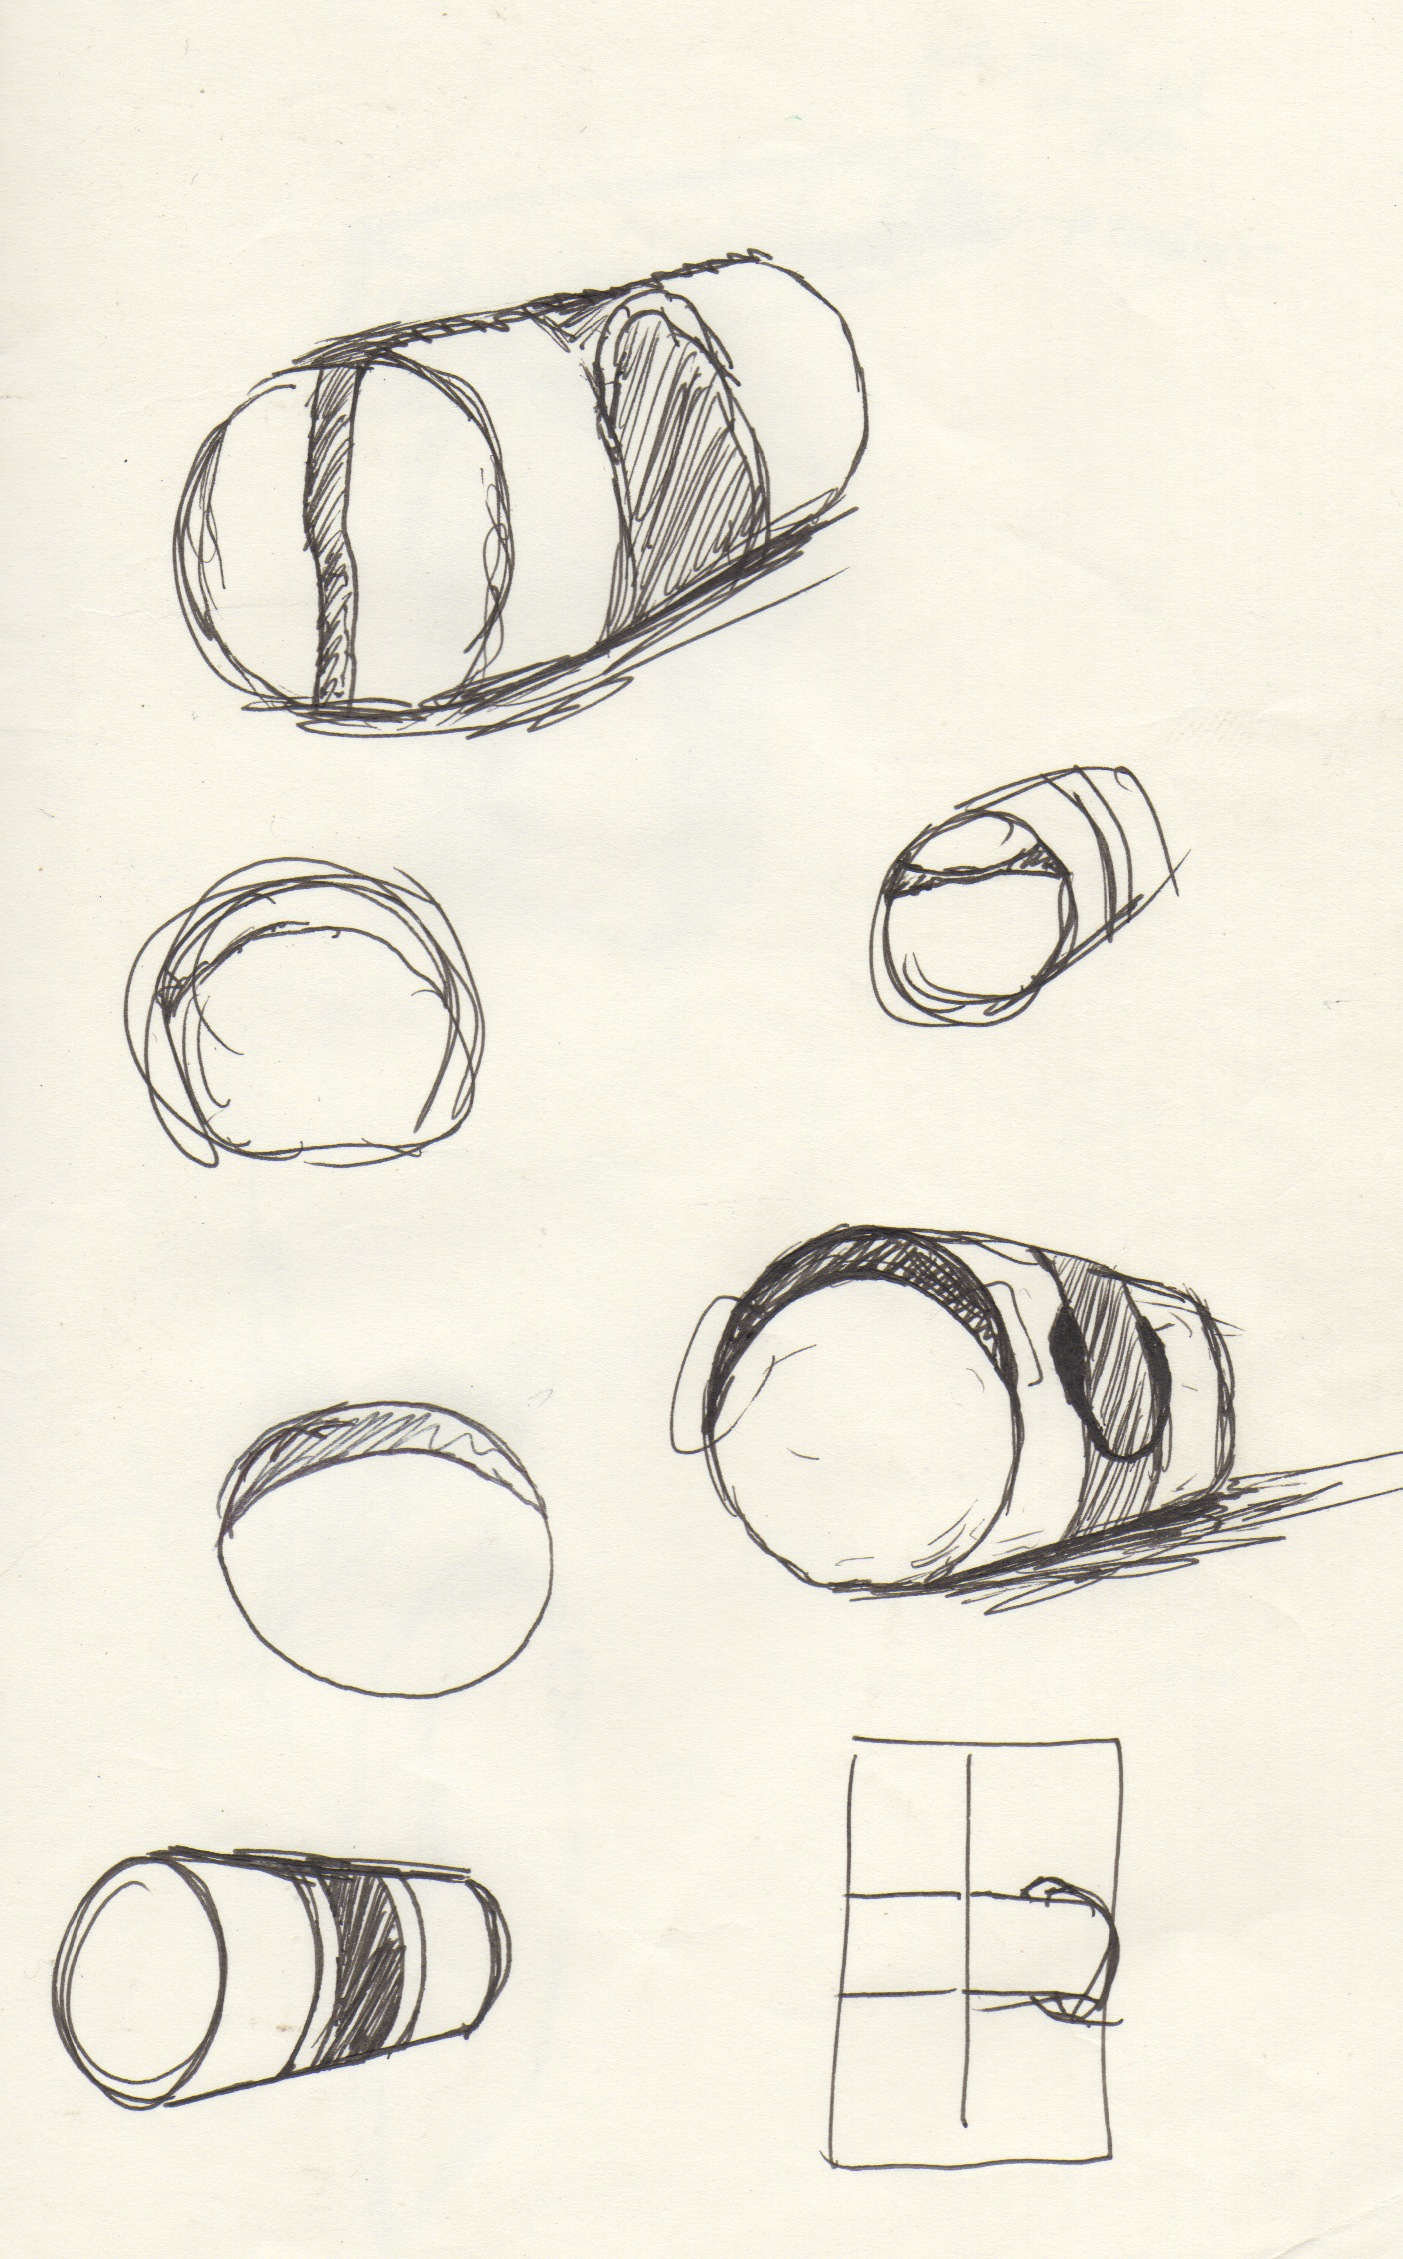 cylindrical bag sketch.jpeg